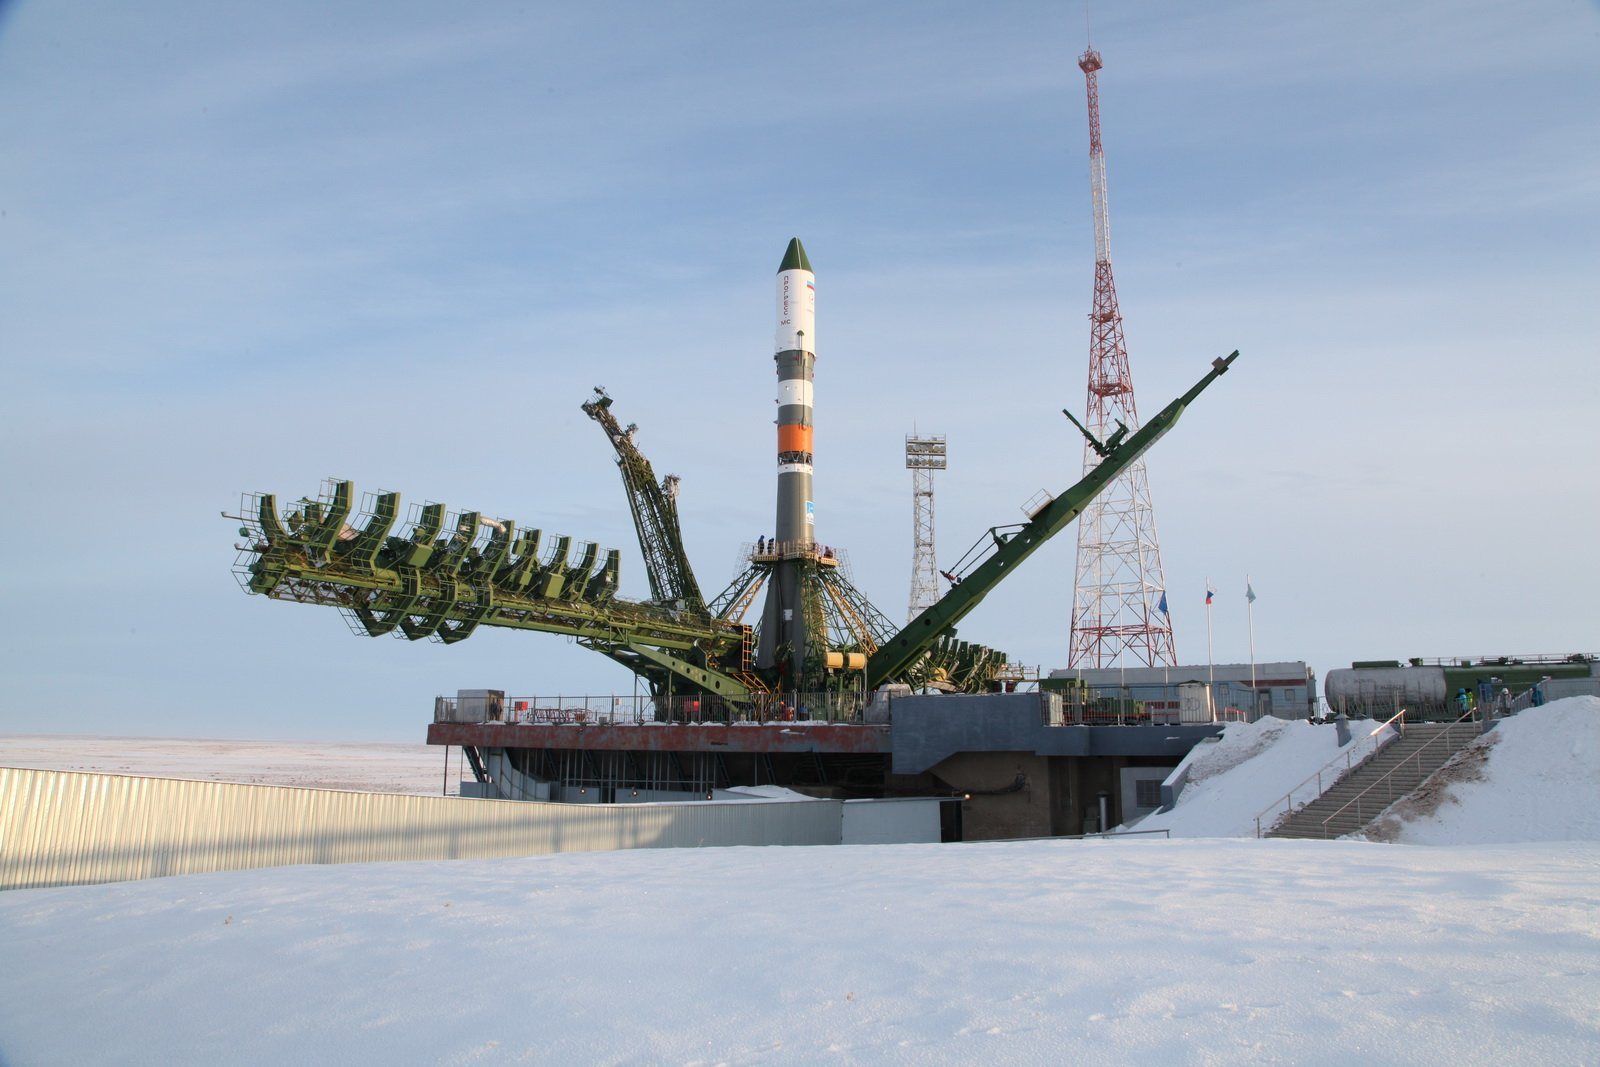 Roscosmos to launch Progress MS-16 resupply ship on 2 day flight to Station - NASASpaceFlight.com - NASASpaceflight.com